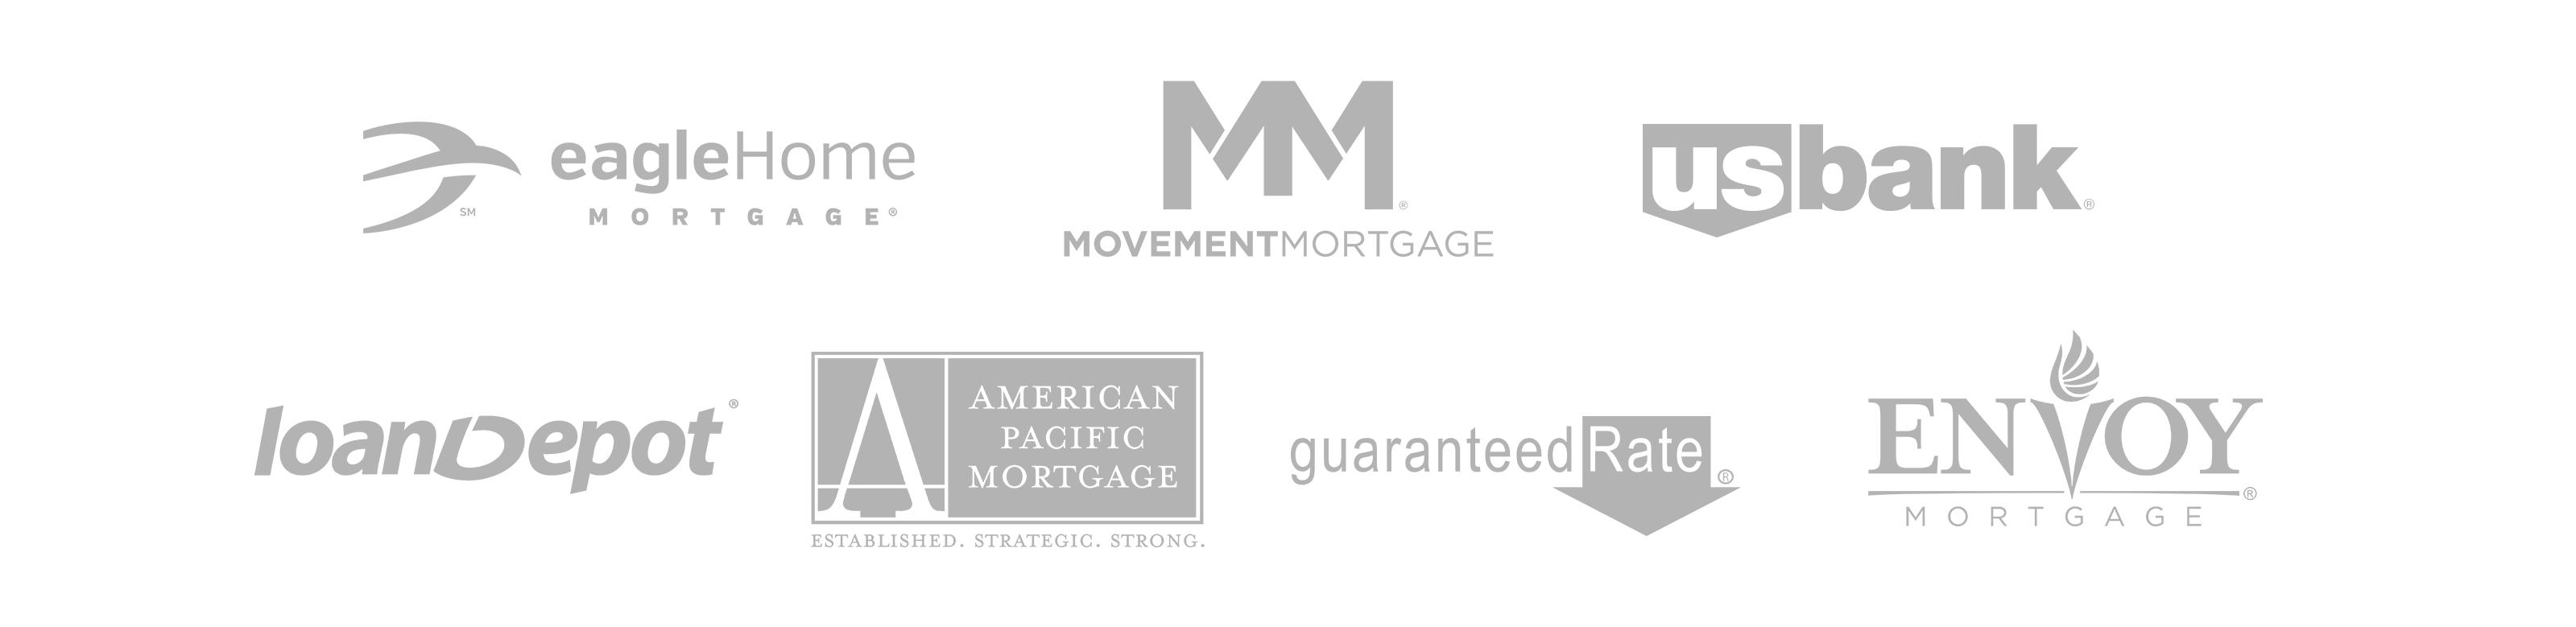 client-logos-Q1-2018.png